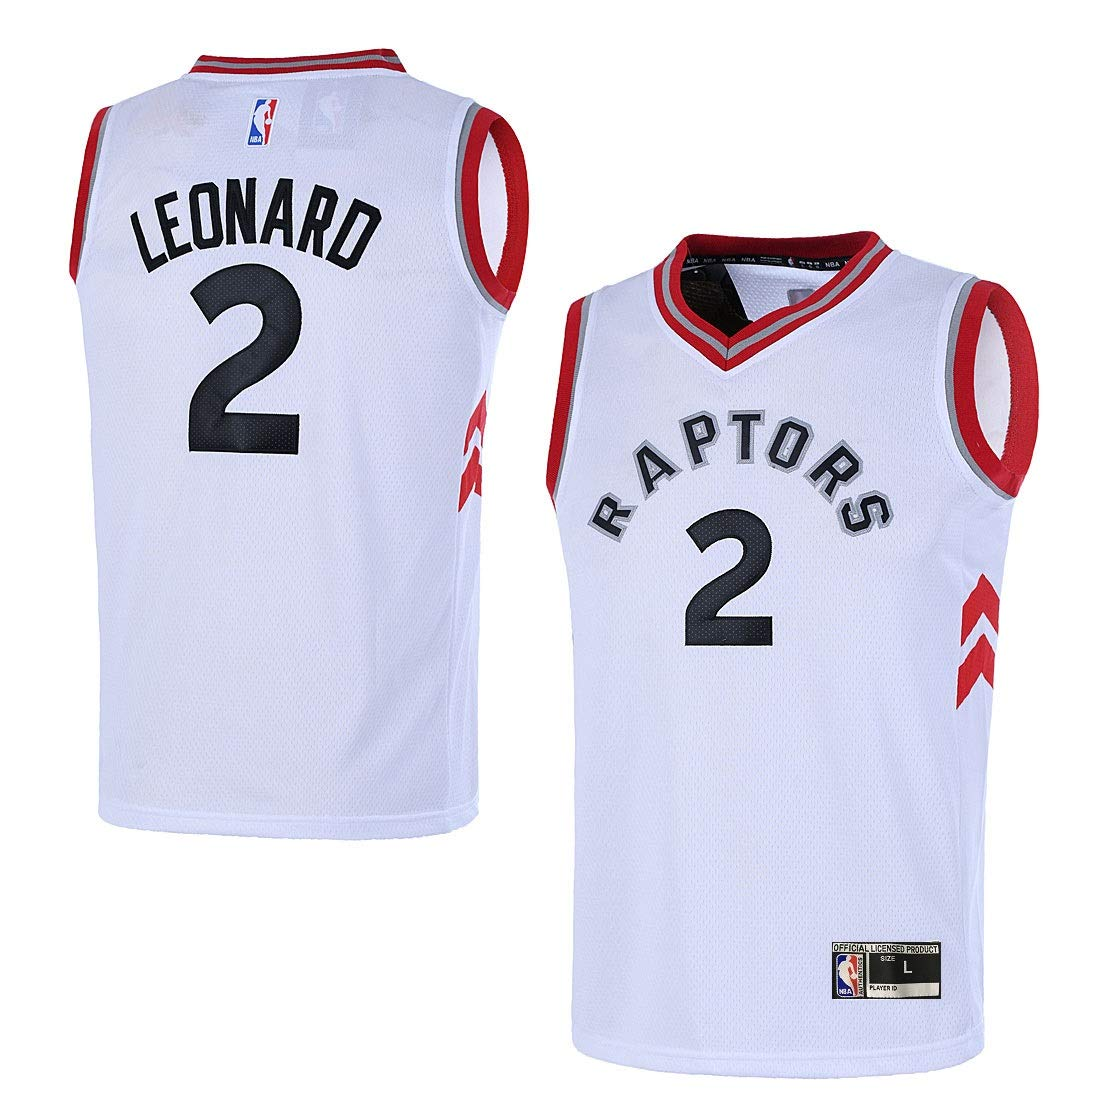 save off d00cb ae13e Outerstuff Youth Toronto Raptors 8-20 #2 Kawhi Leonard Jersey